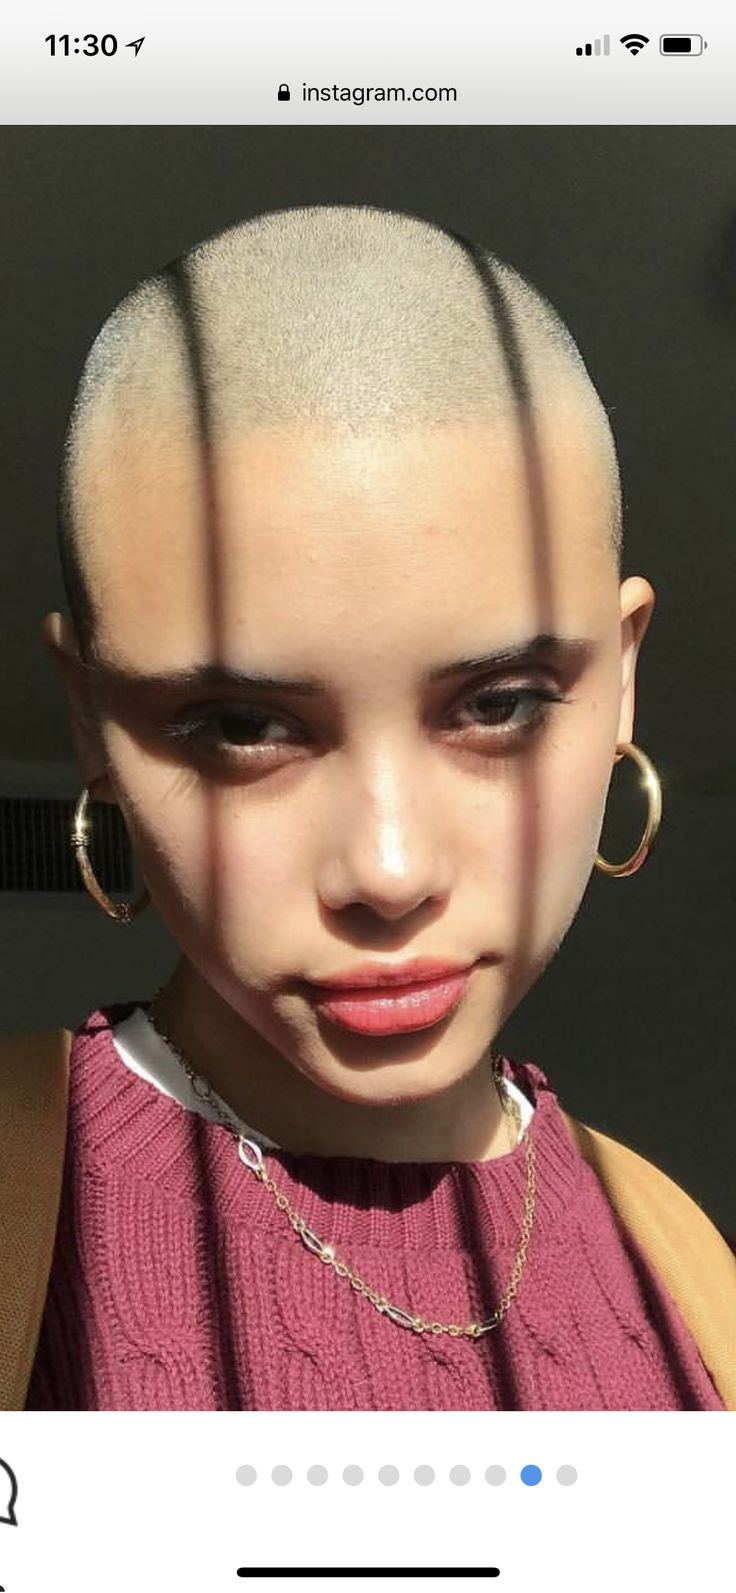 Best 25 Bald Women Ideas On Pinterest  Freckle Face -4434